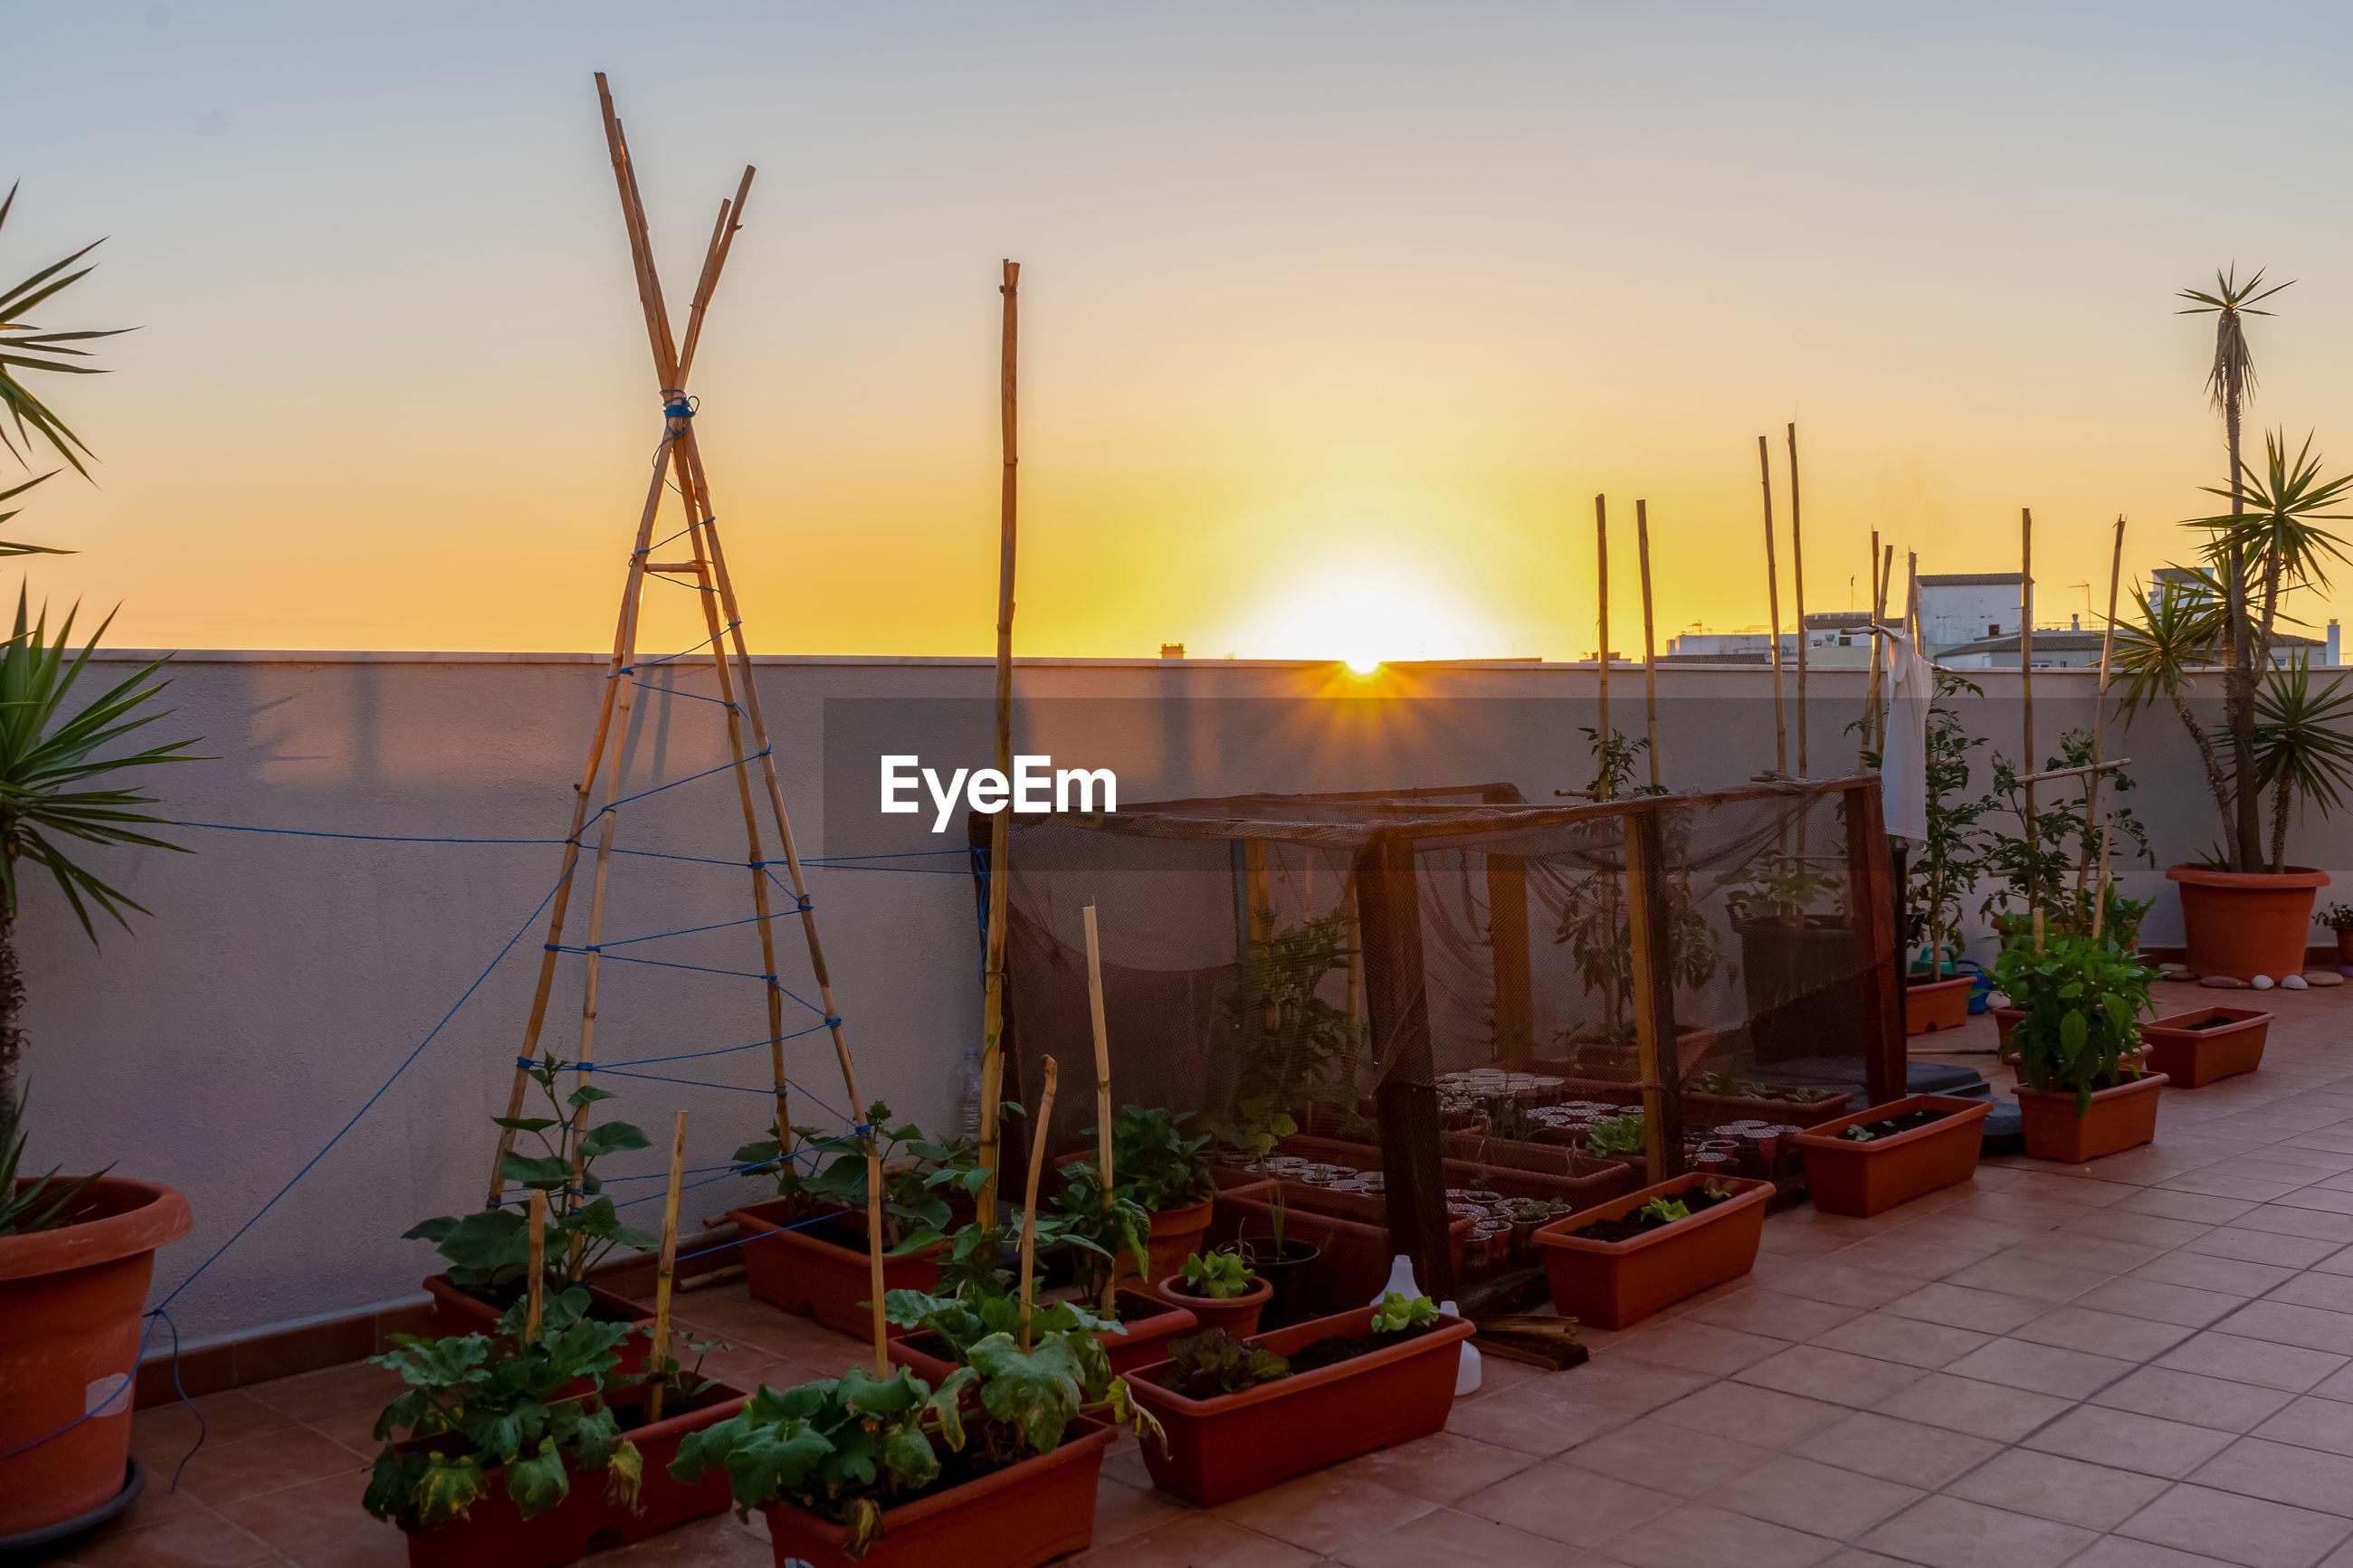 POTTED PLANTS AGAINST ORANGE SKY DURING SUNSET